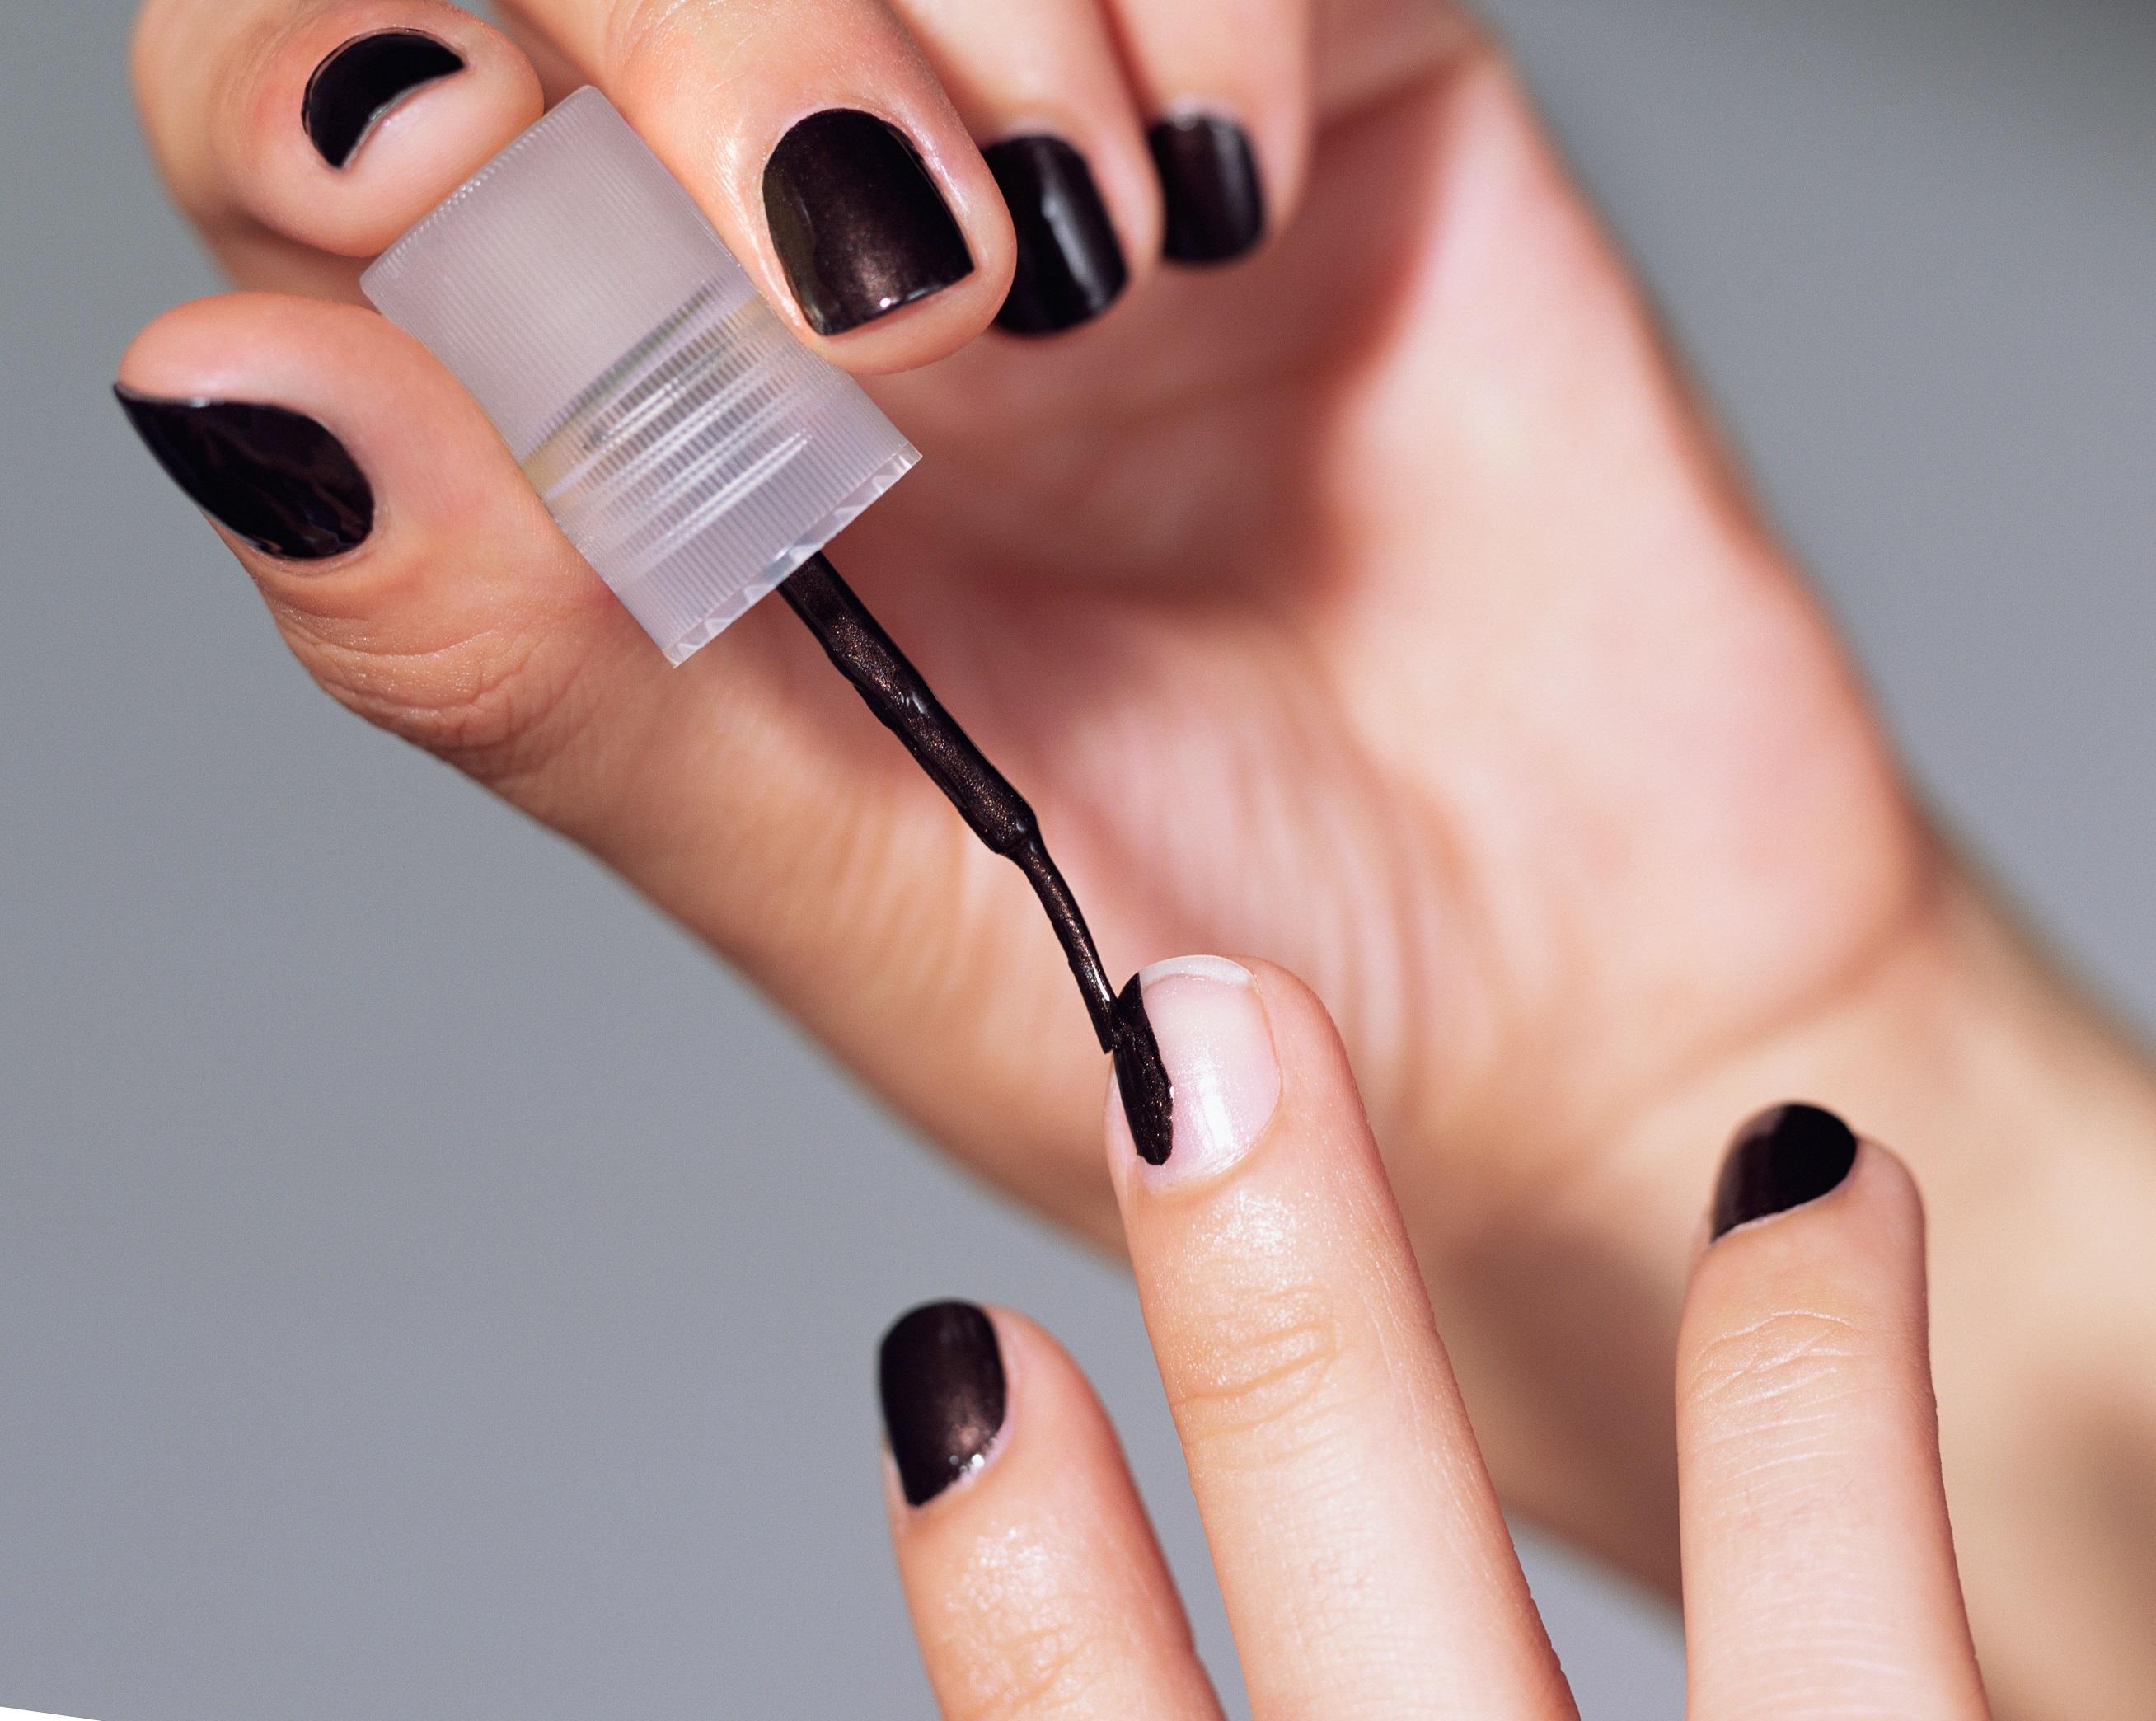 Картинки как накрасить красиво ногти